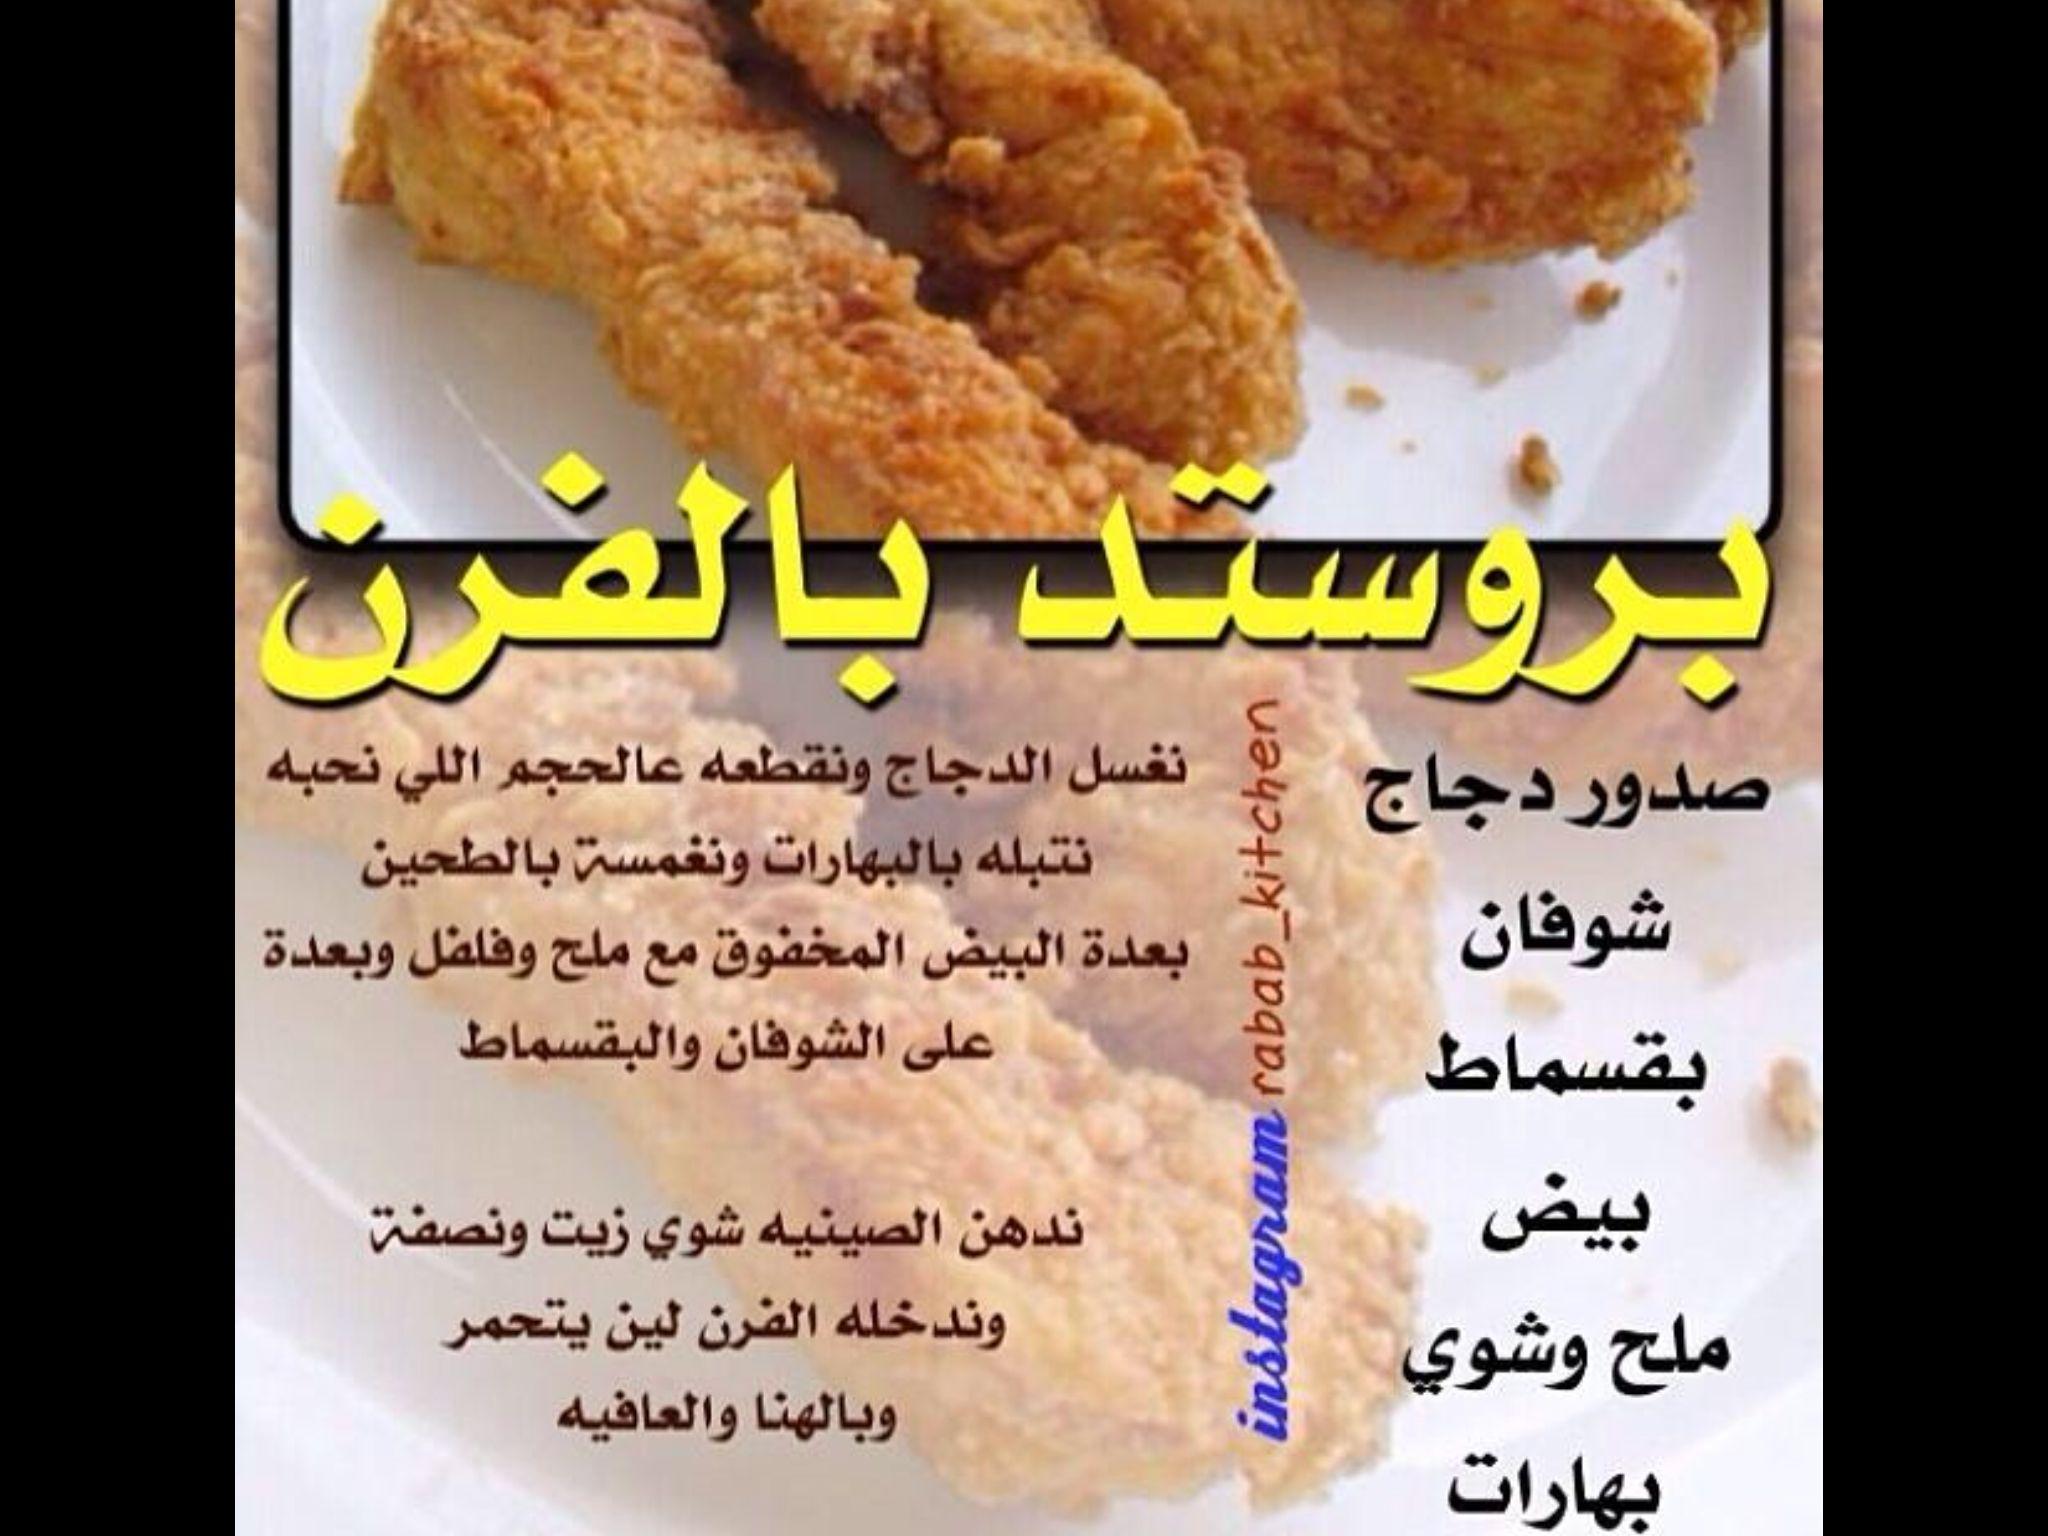 بروستد بالفرن Plane Food Food Food And Drink